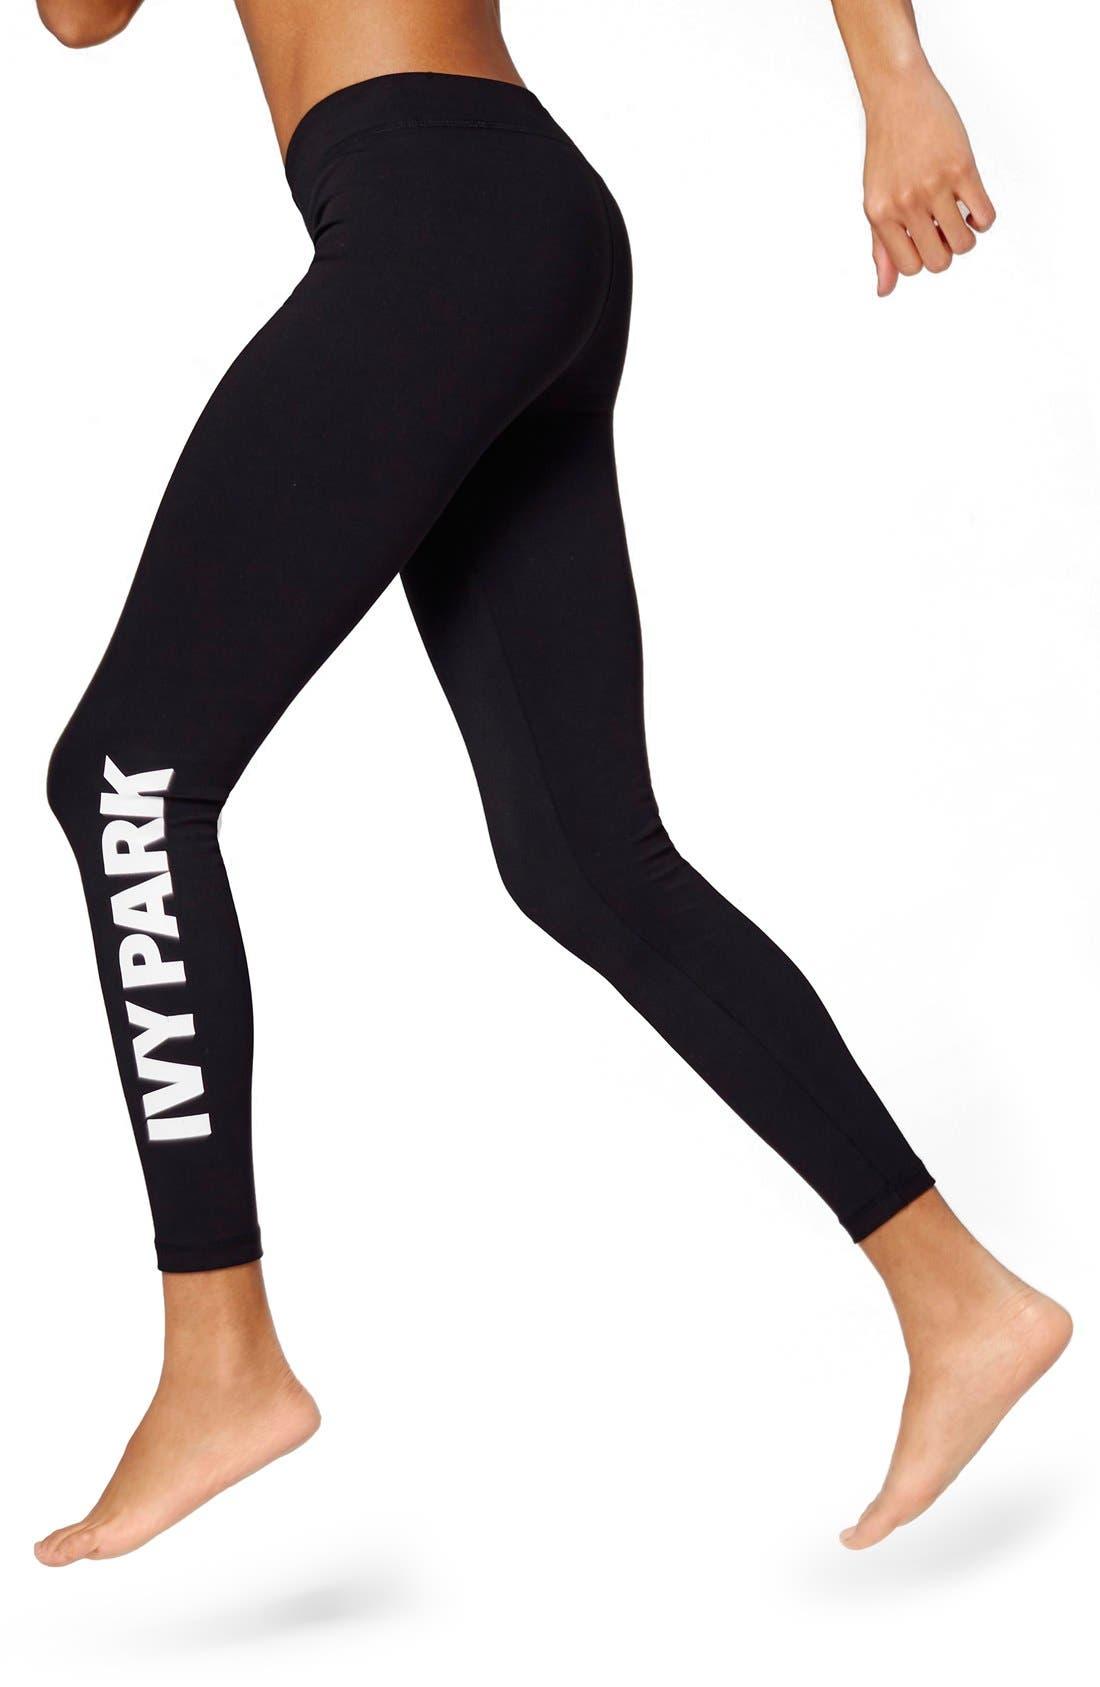 Alternate Image 1 Selected - IVY PARK® Logo Mid Rise Ankle Leggings